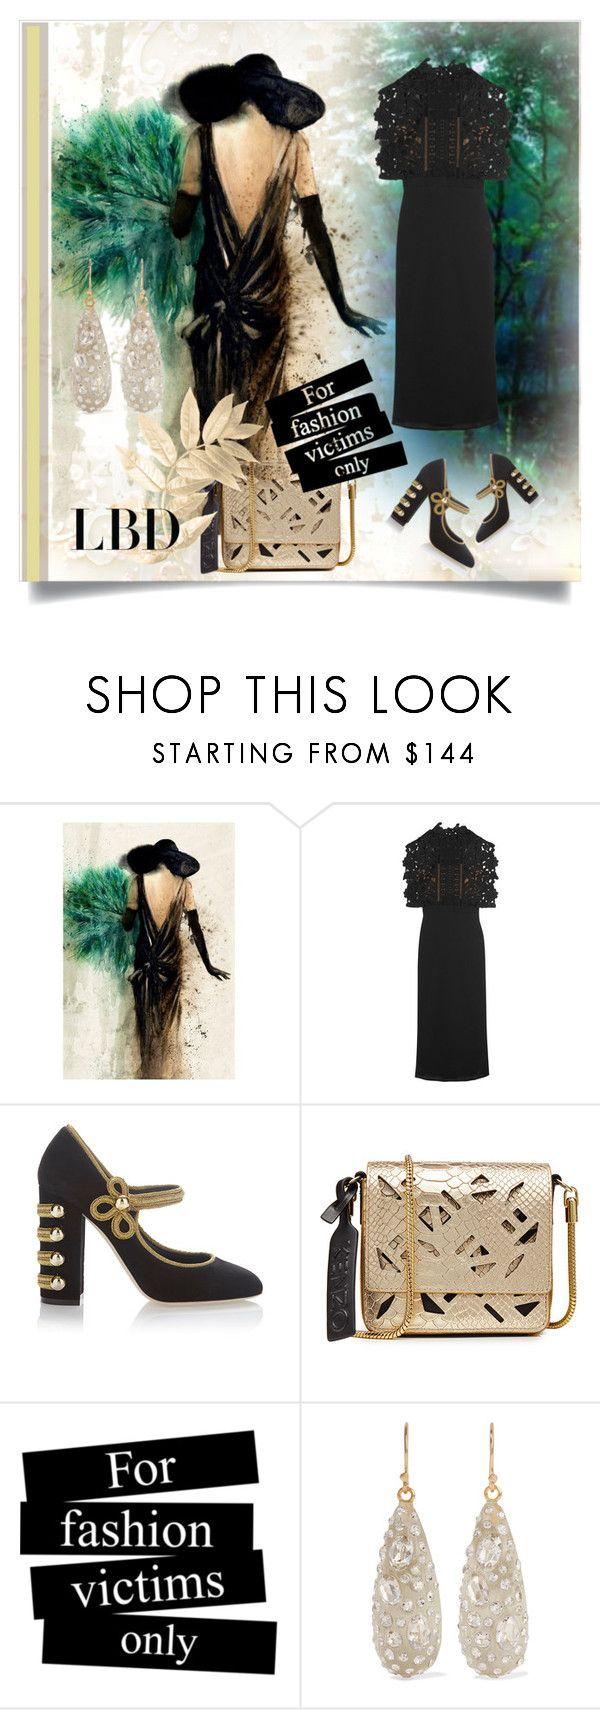 """Little Black Dress"" by kari-c ❤ liked on Polyvore featuring Leftbank Art, self-portrait, Dolce&Gabbana, Kenzo, Alexis Bittar and LBD"